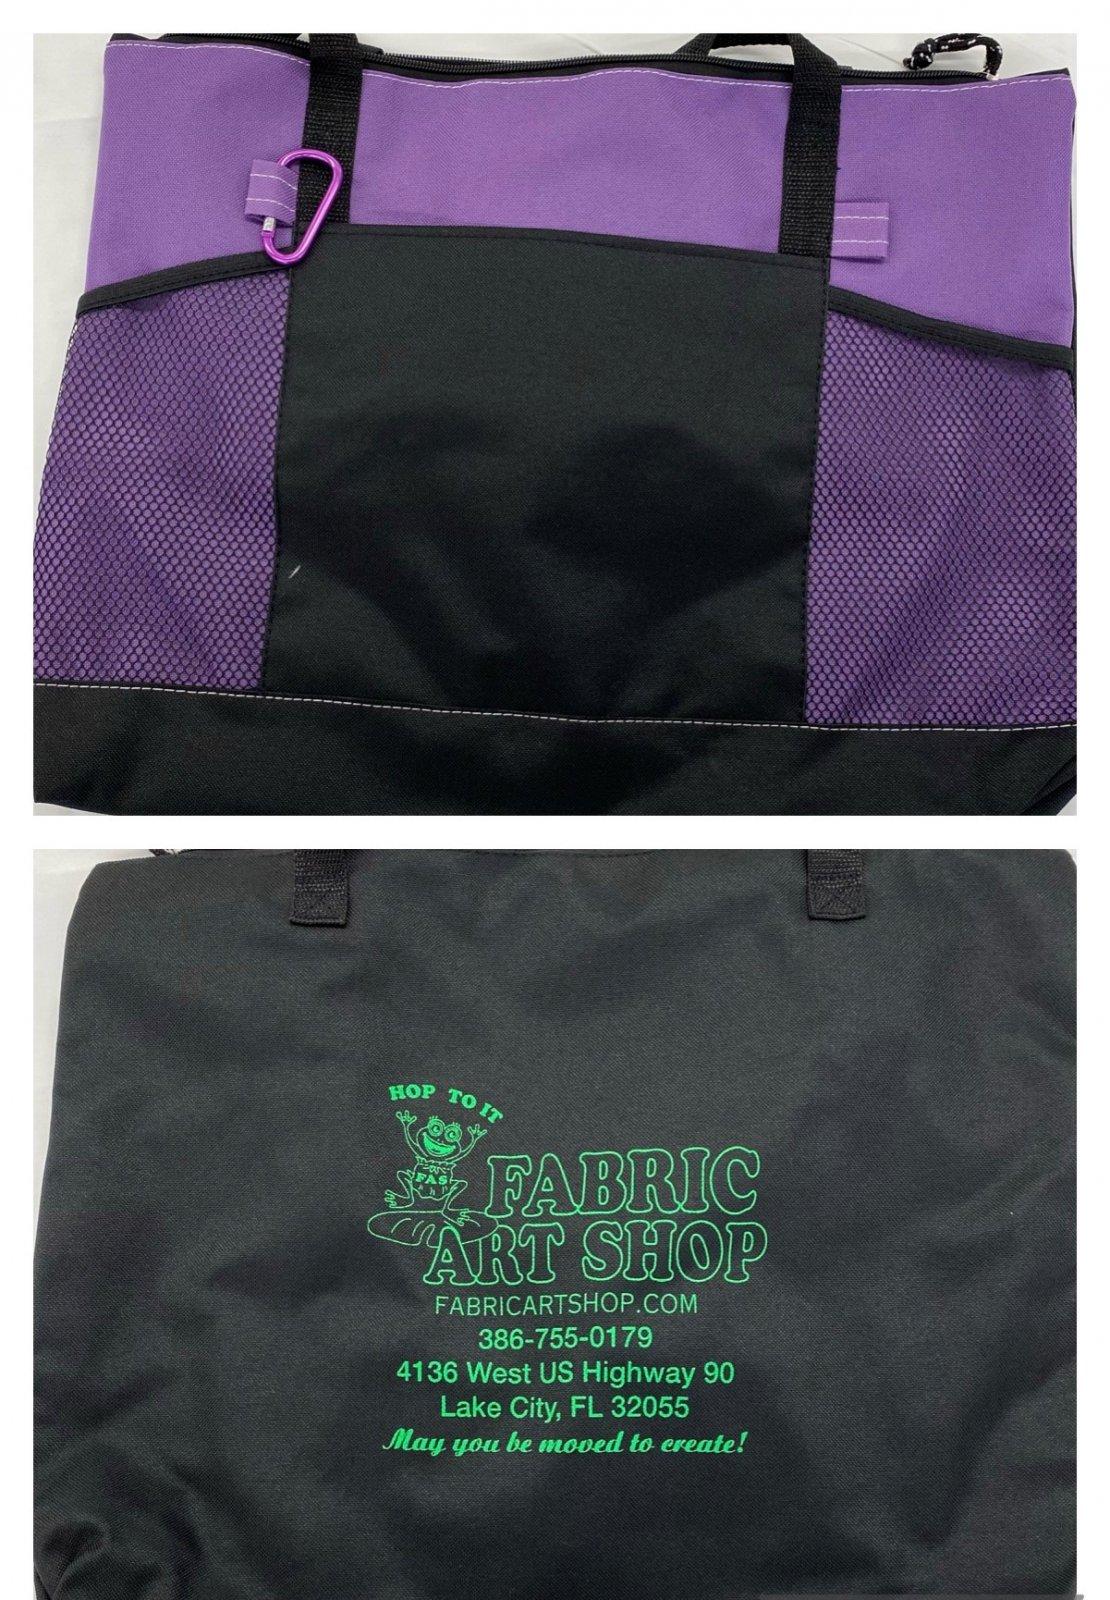 Fabric Art Shop Premium Zippered Tote Bag